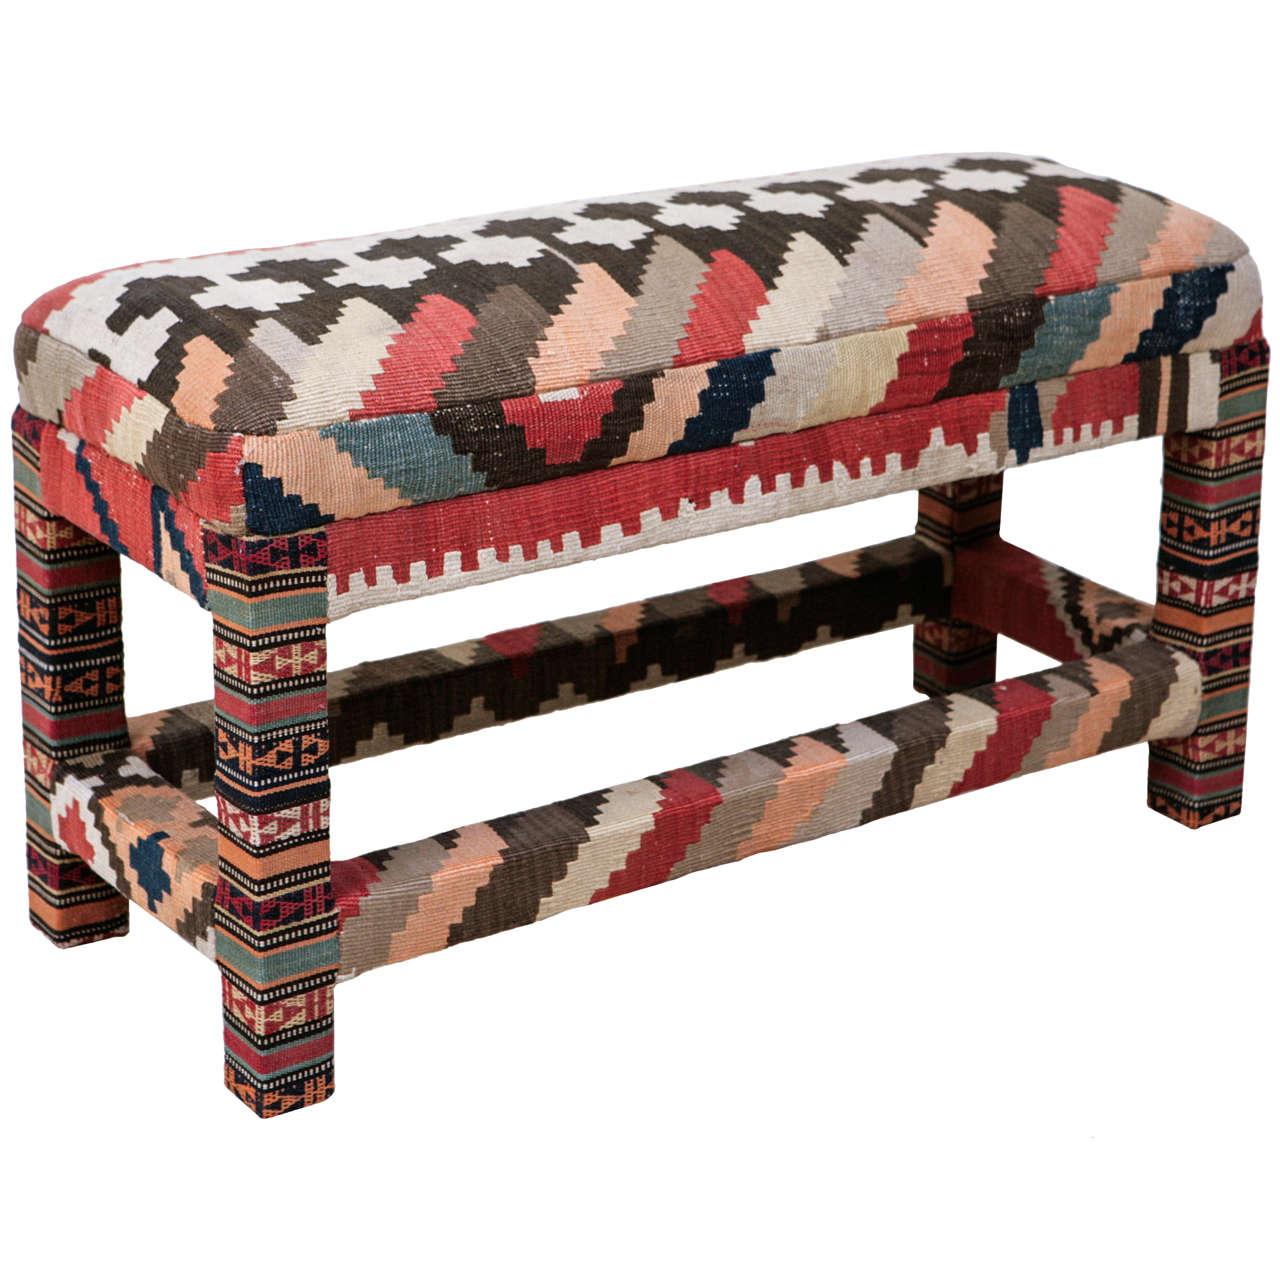 Kilim Upholstered Bench At 1stdibs